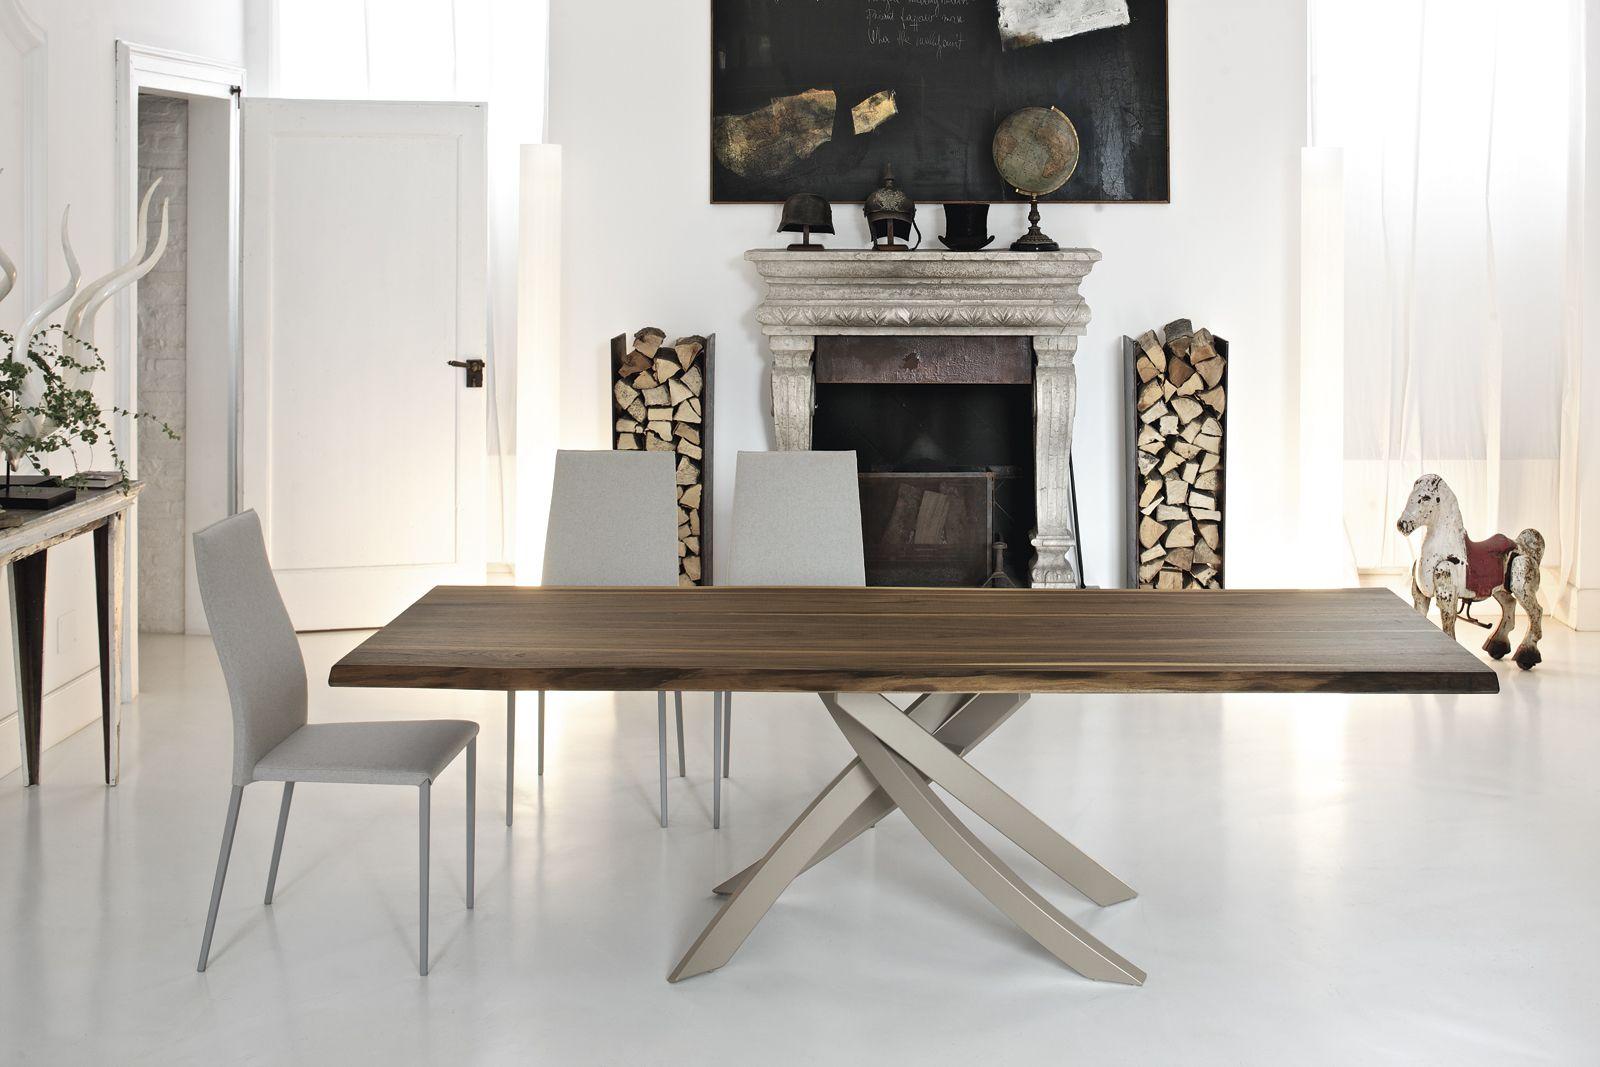 bontempi mobili tavoli sedie complementi divani